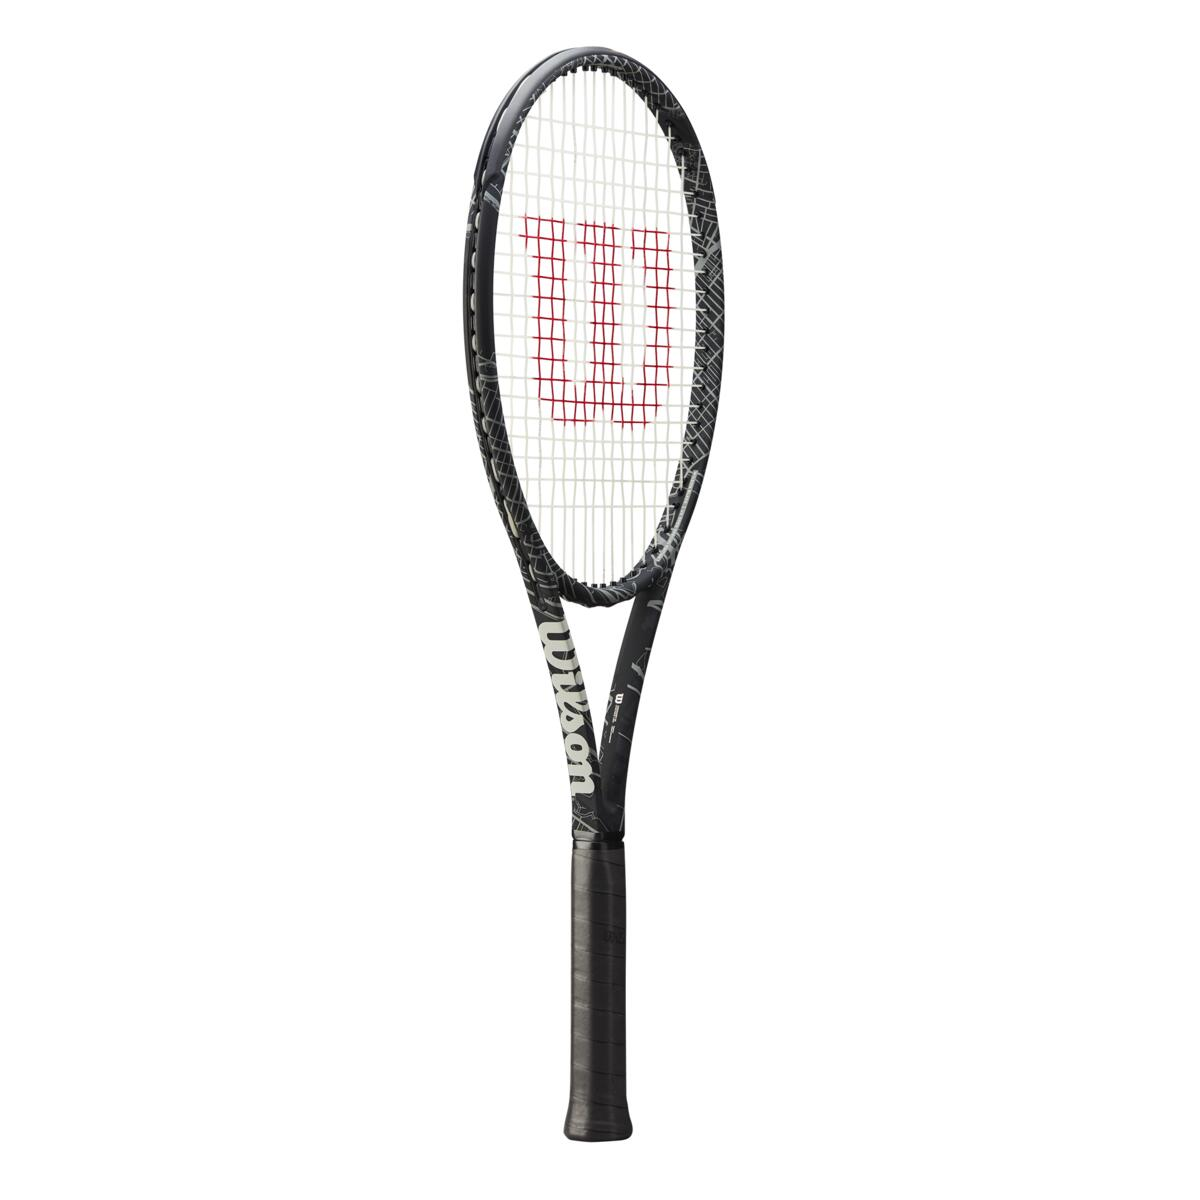 Wilson Blade 98 16/19 v8 Tennis Racquet – US Open Limited Edition